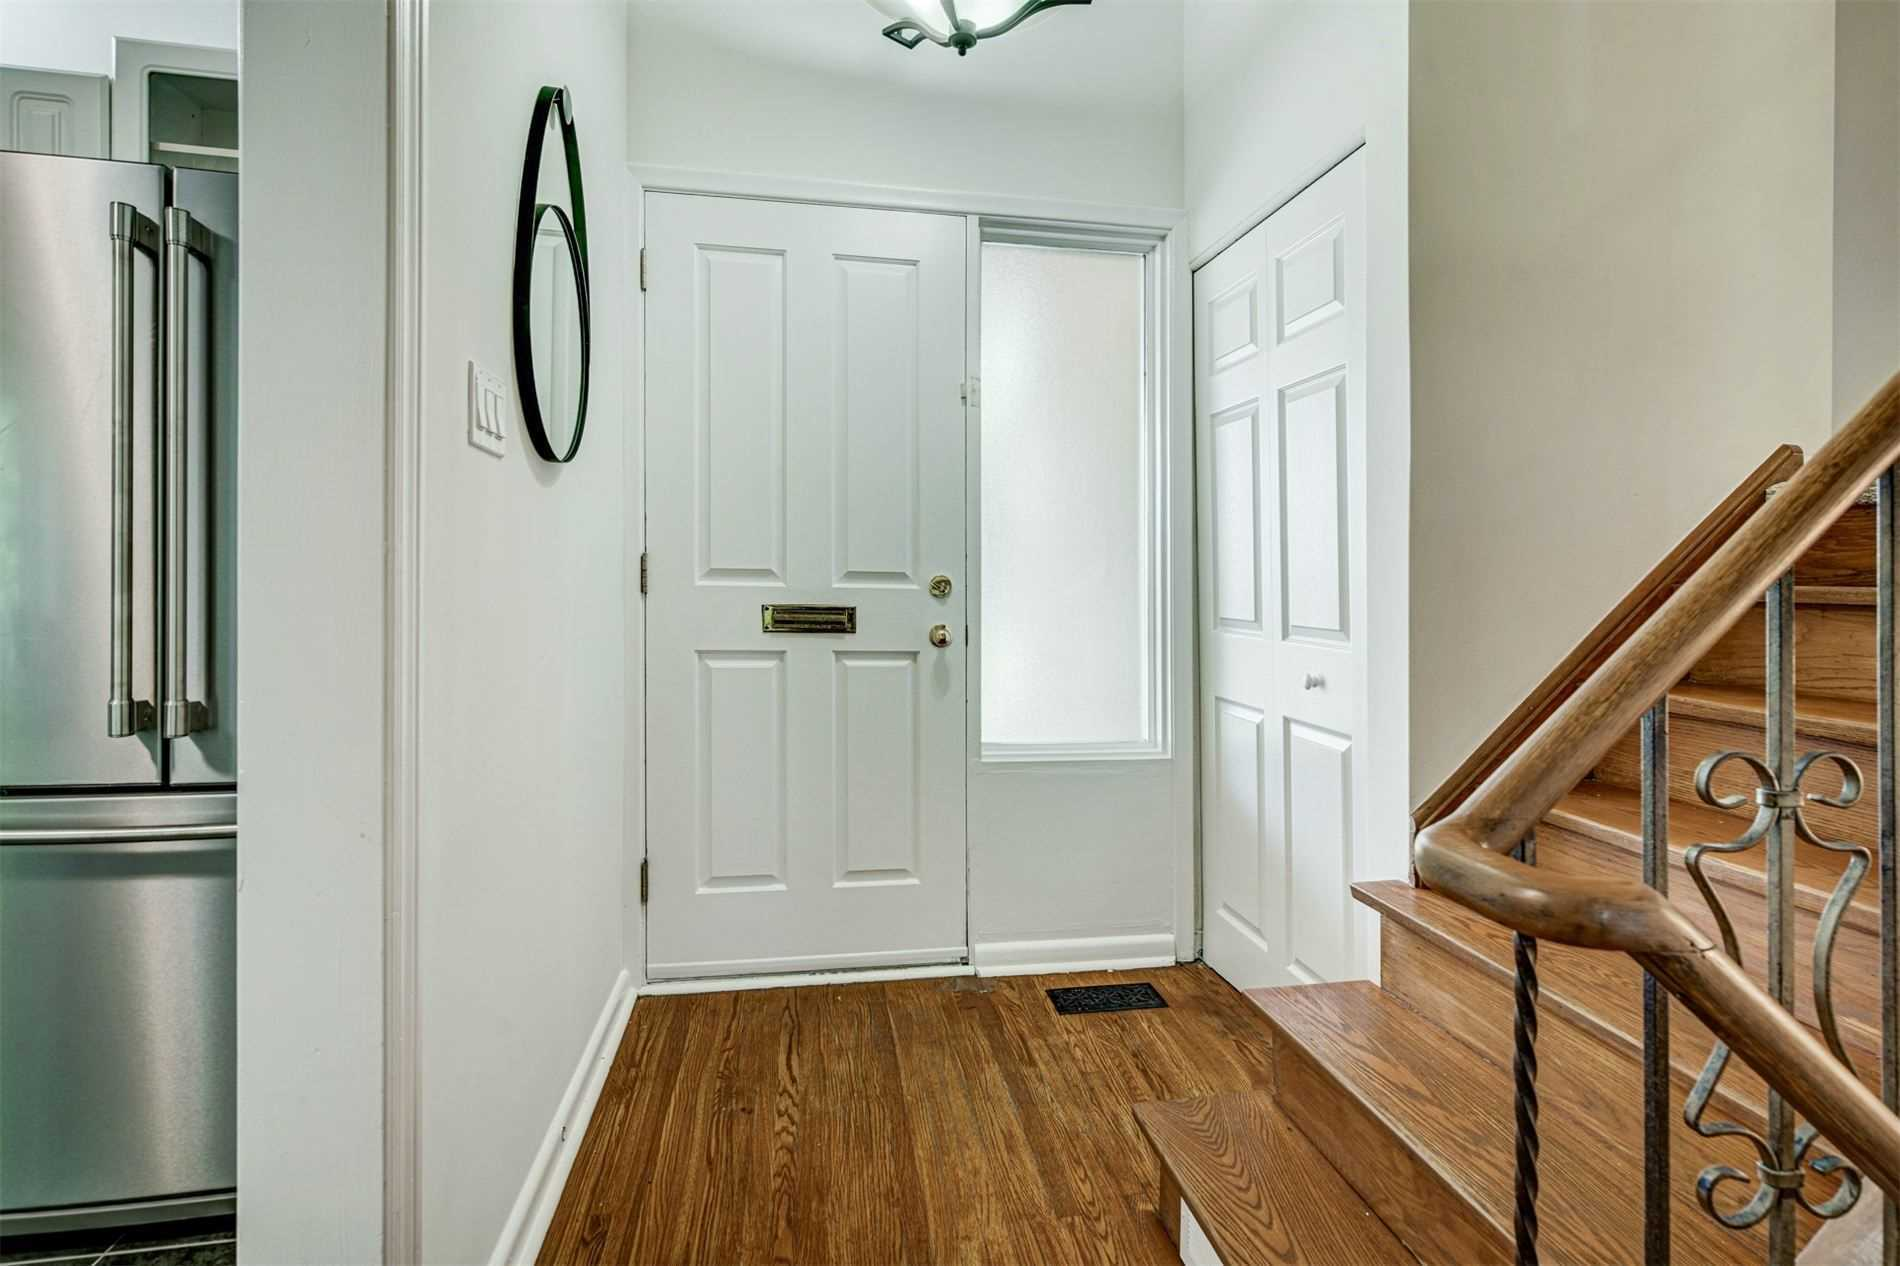 140 Verobeach Blvd - Humbermede Detached for sale, 3 Bedrooms (W5385046) - #10